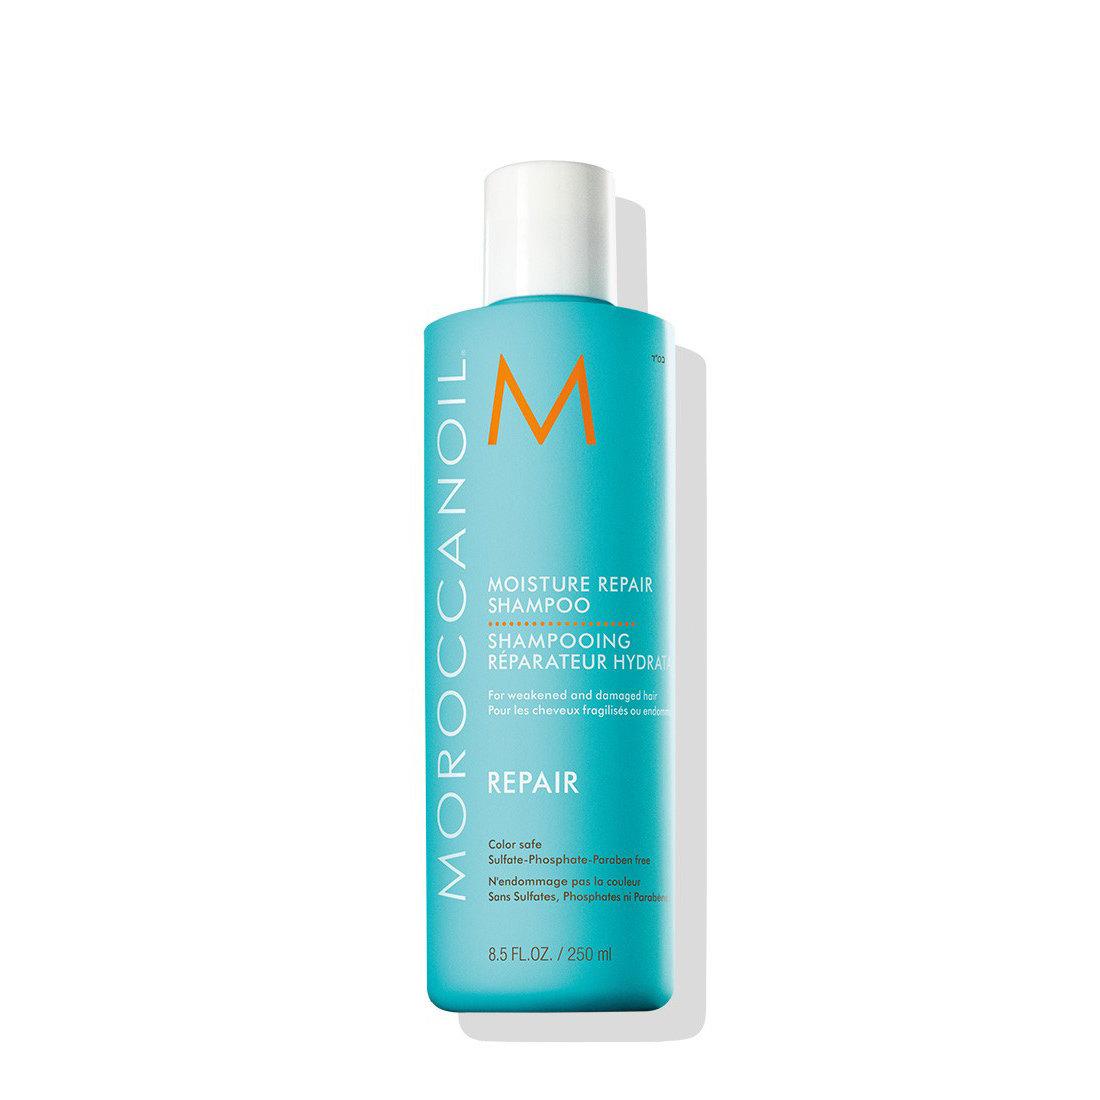 Moroccanoil Moisture Repair Shampoo 250 ml   Shampoo Reparador Hidratante